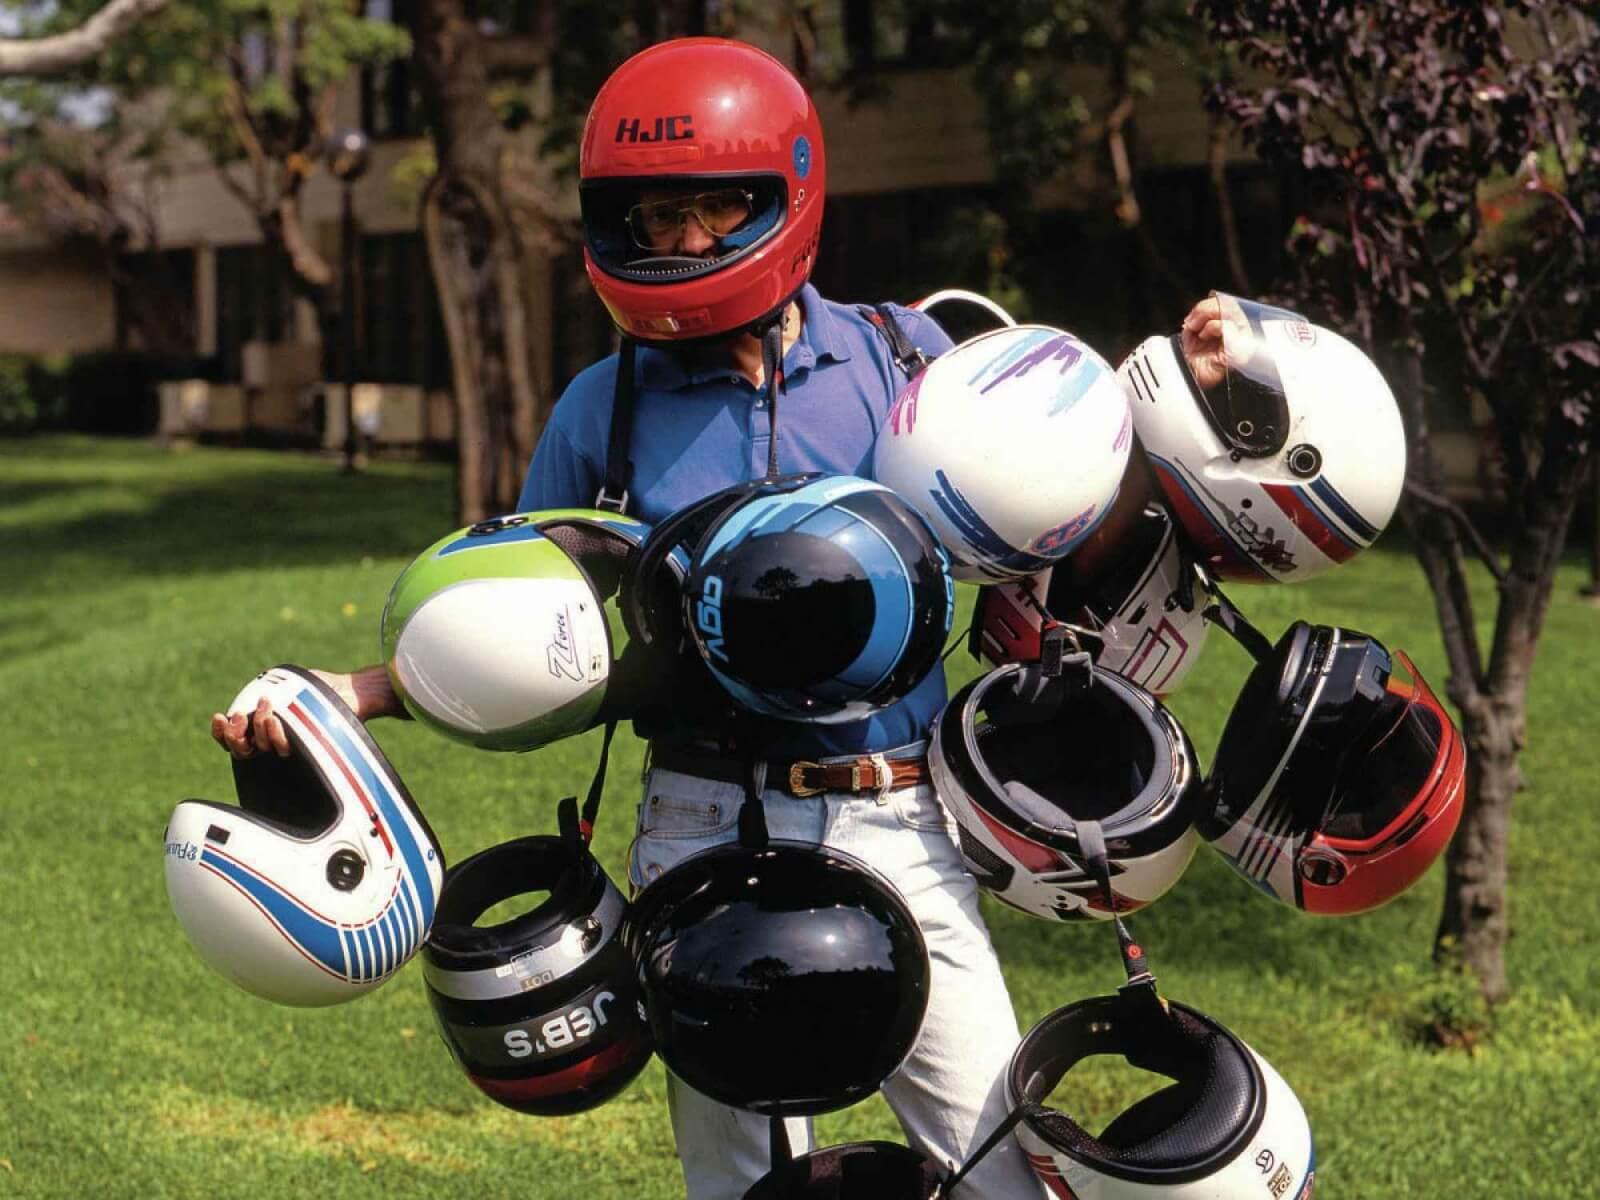 levensduur-motorhelm-beste-helm